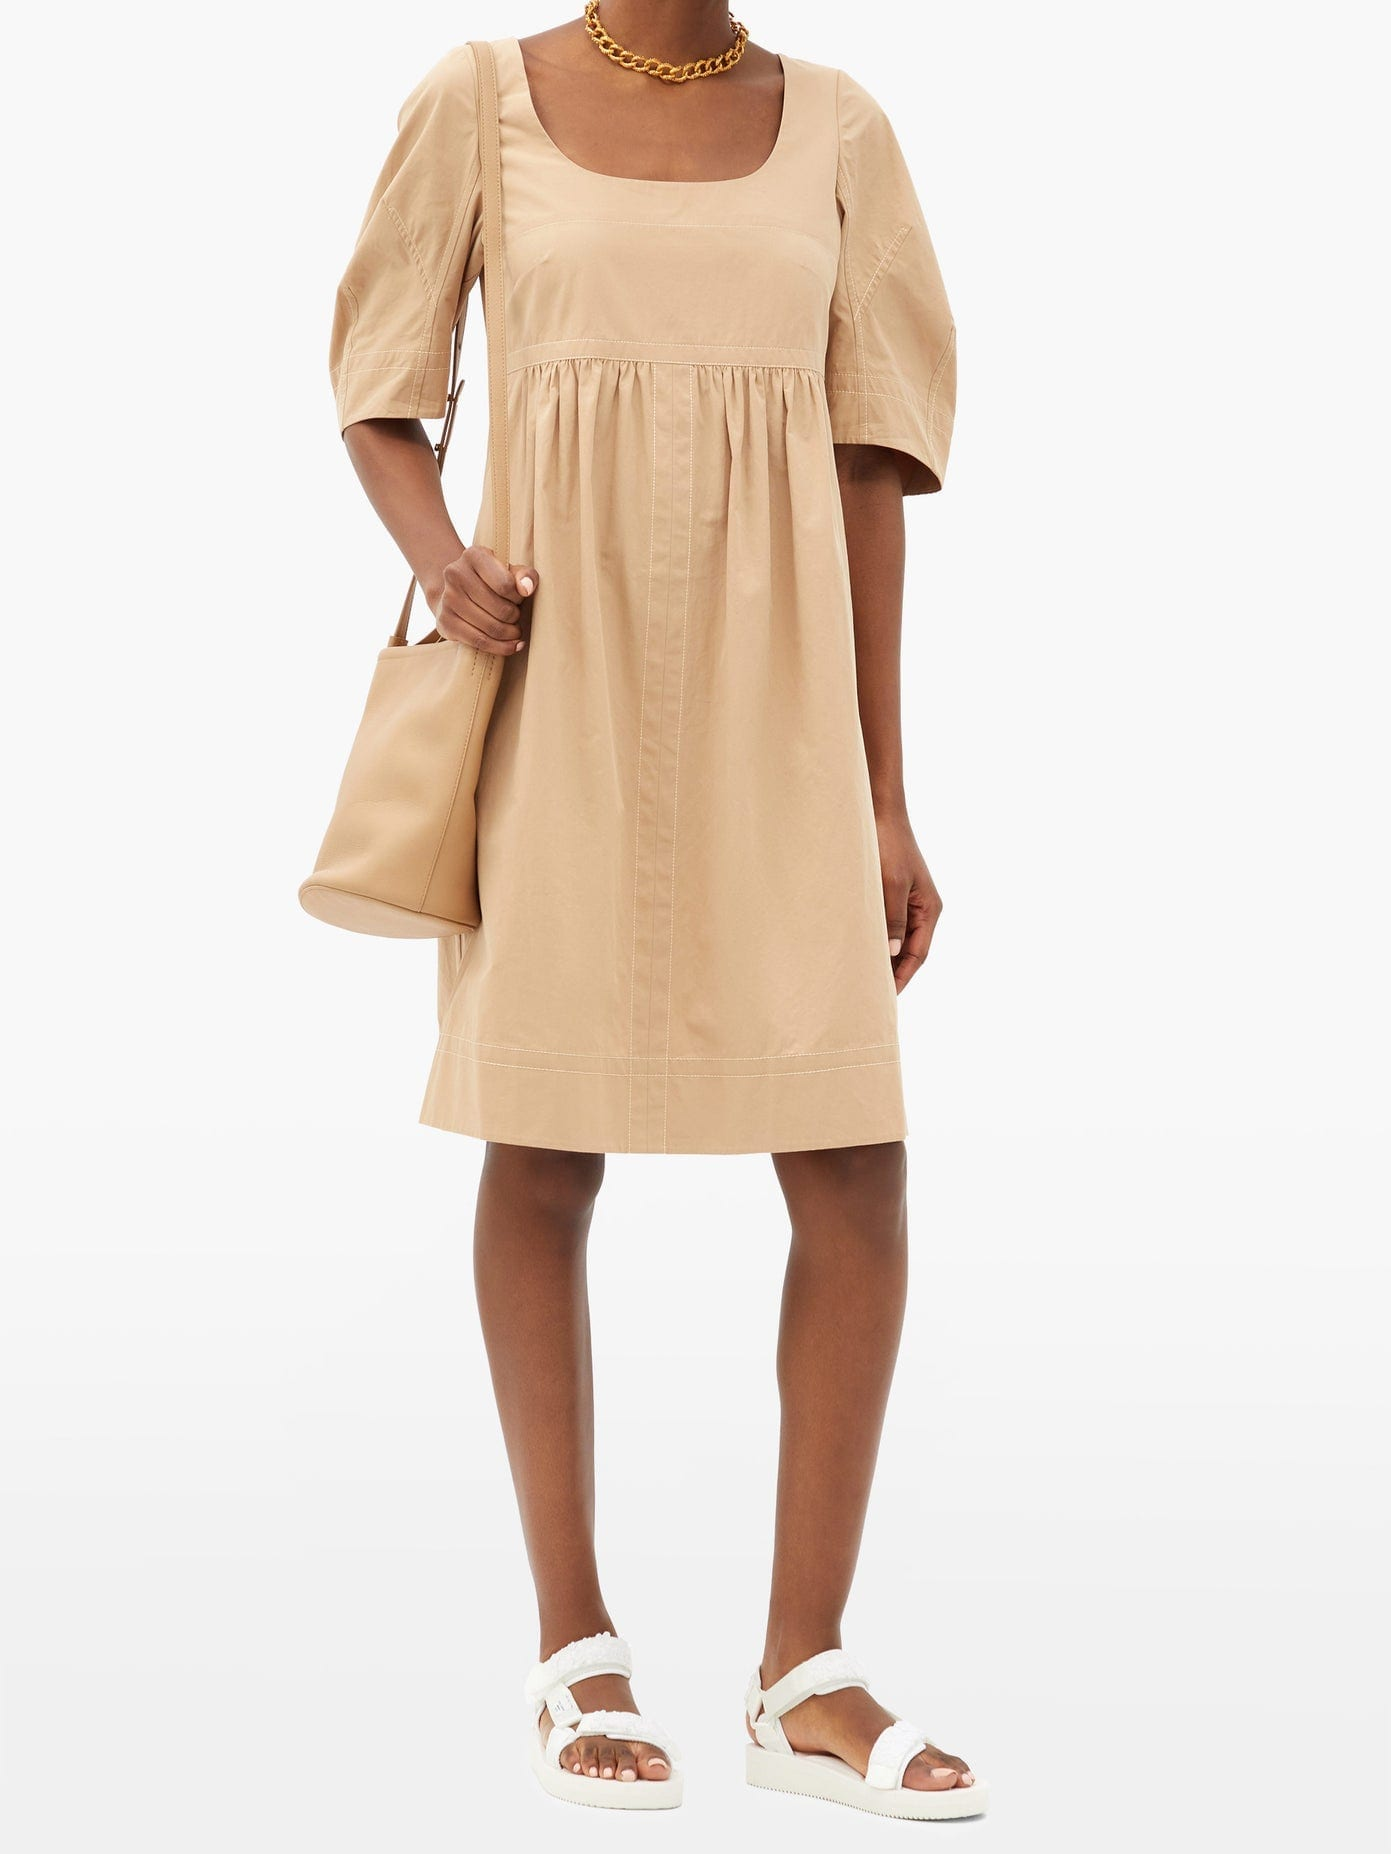 LEE MATHEWS May Square-neck Topstitched Cotton Dress